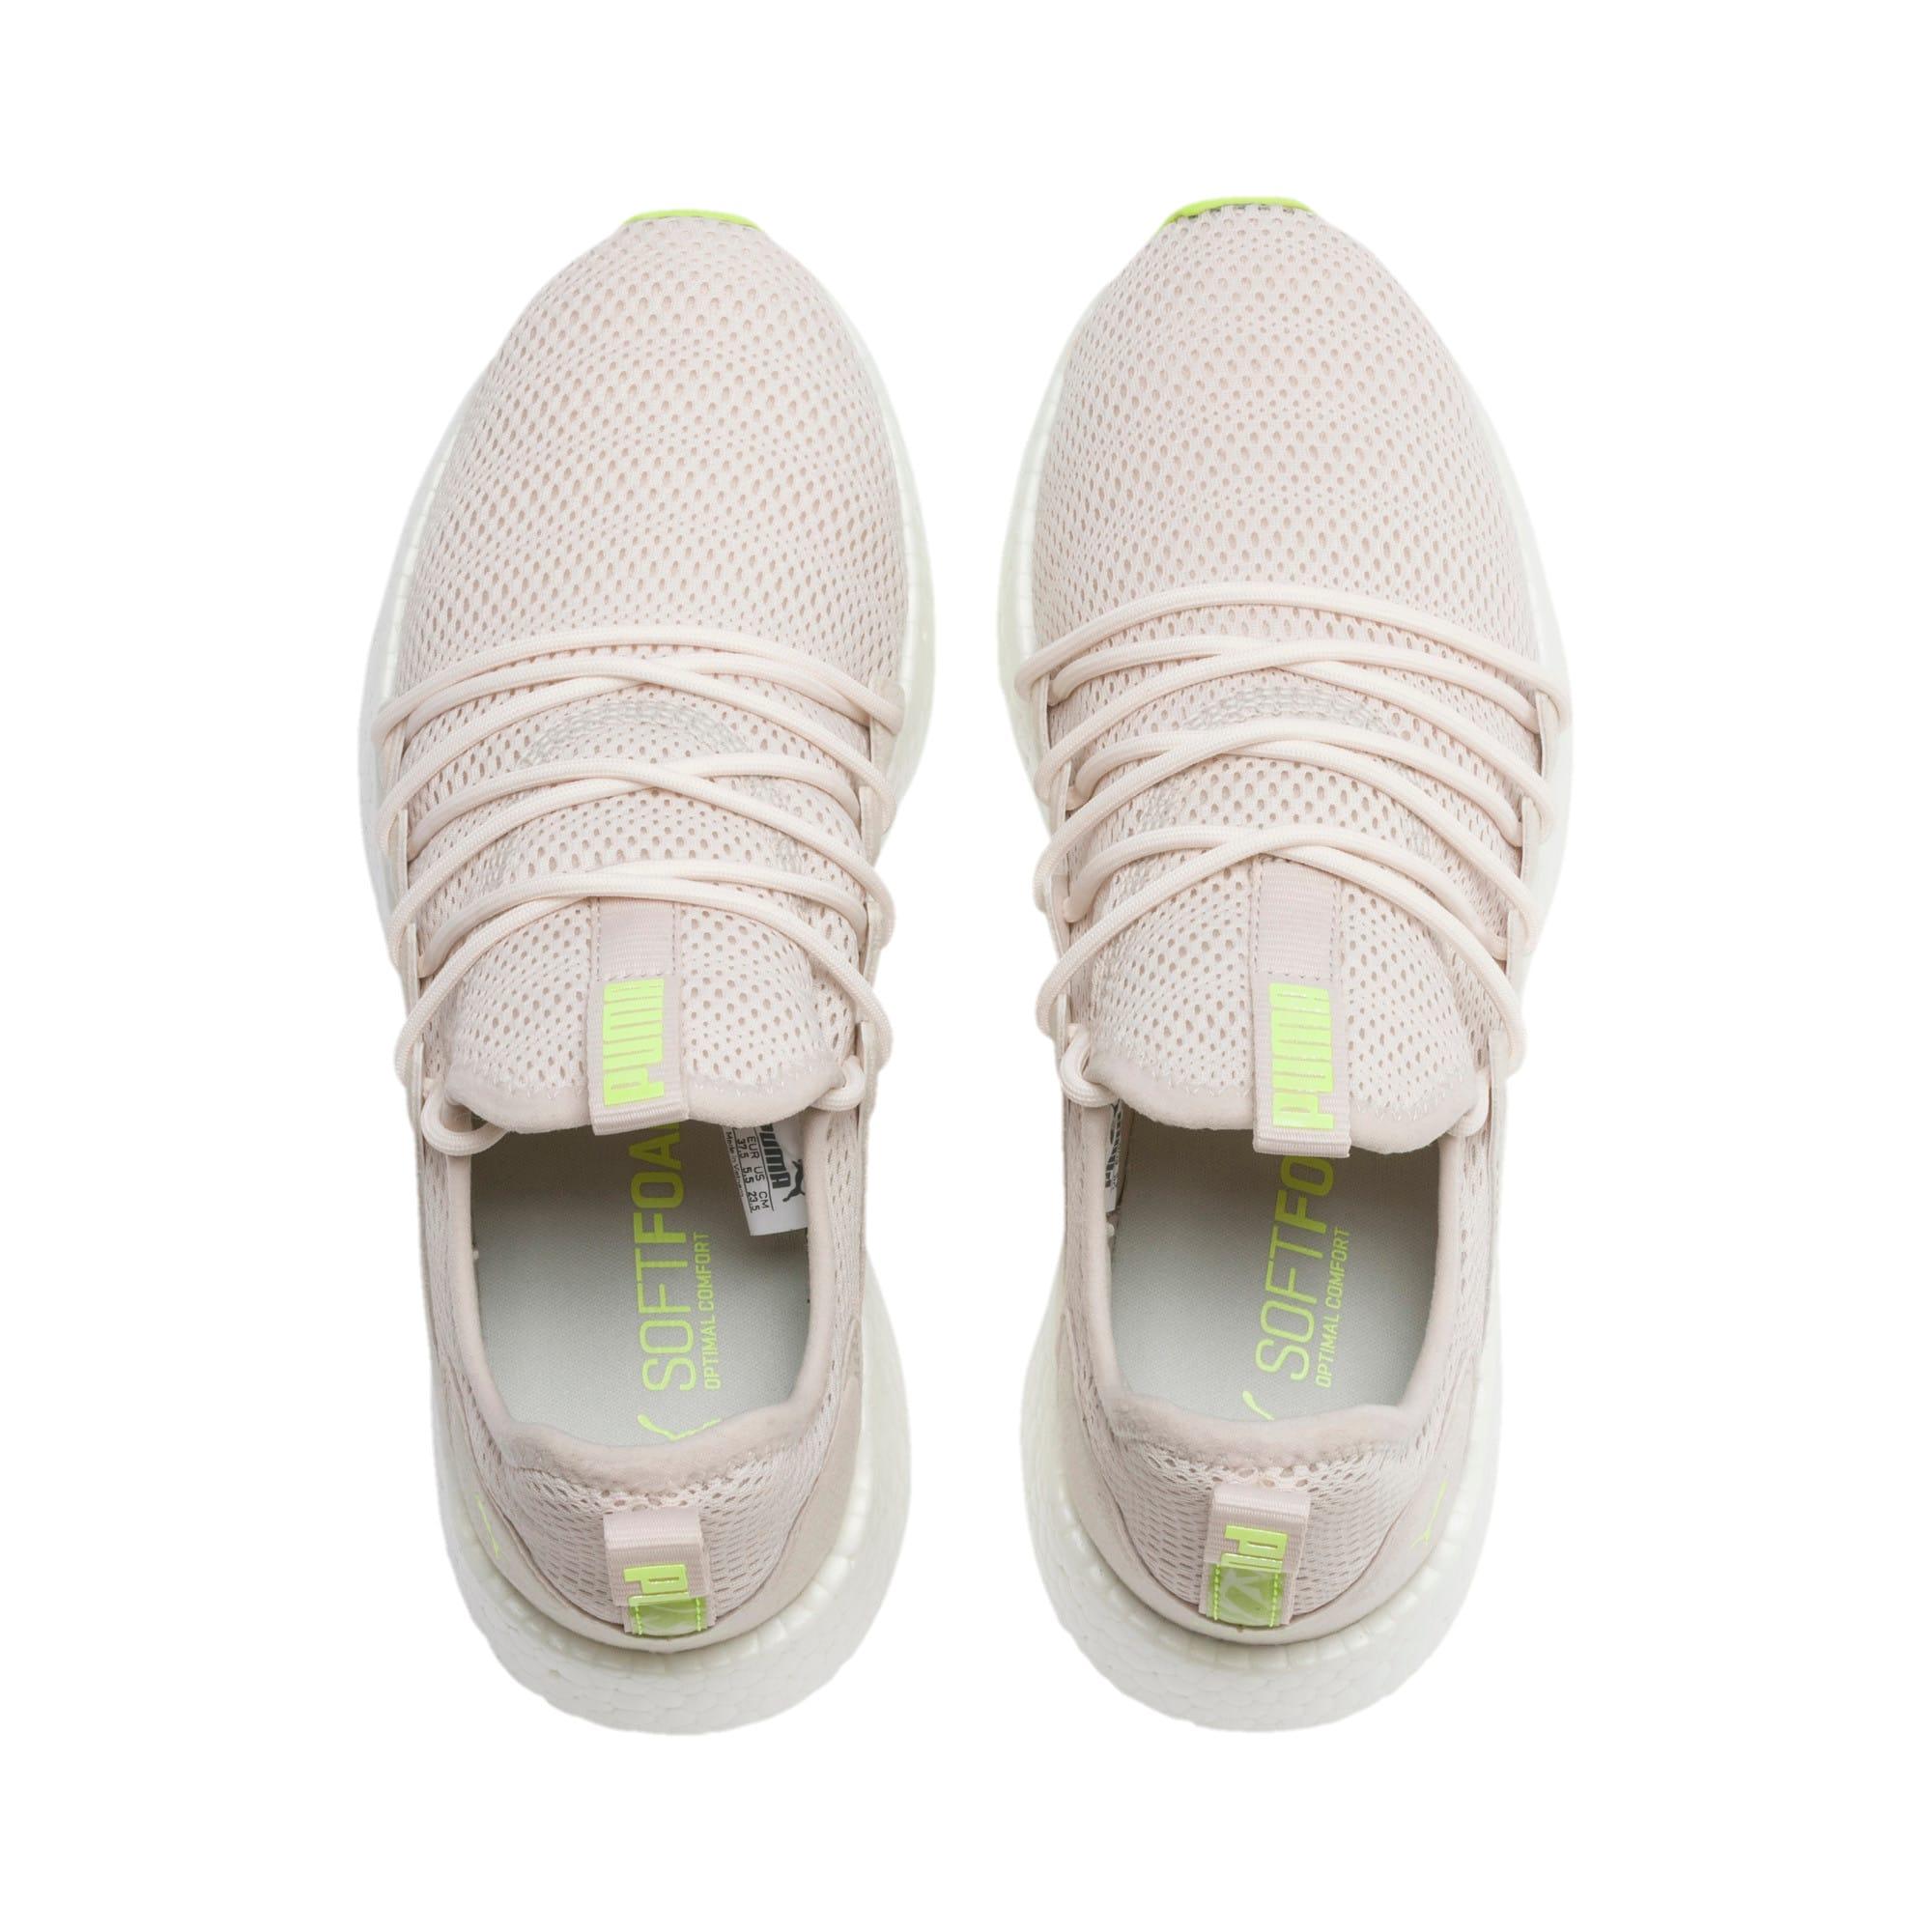 Thumbnail 7 of NRGY Neko Shift Women's Running Shoes, Pastel Parchment, medium